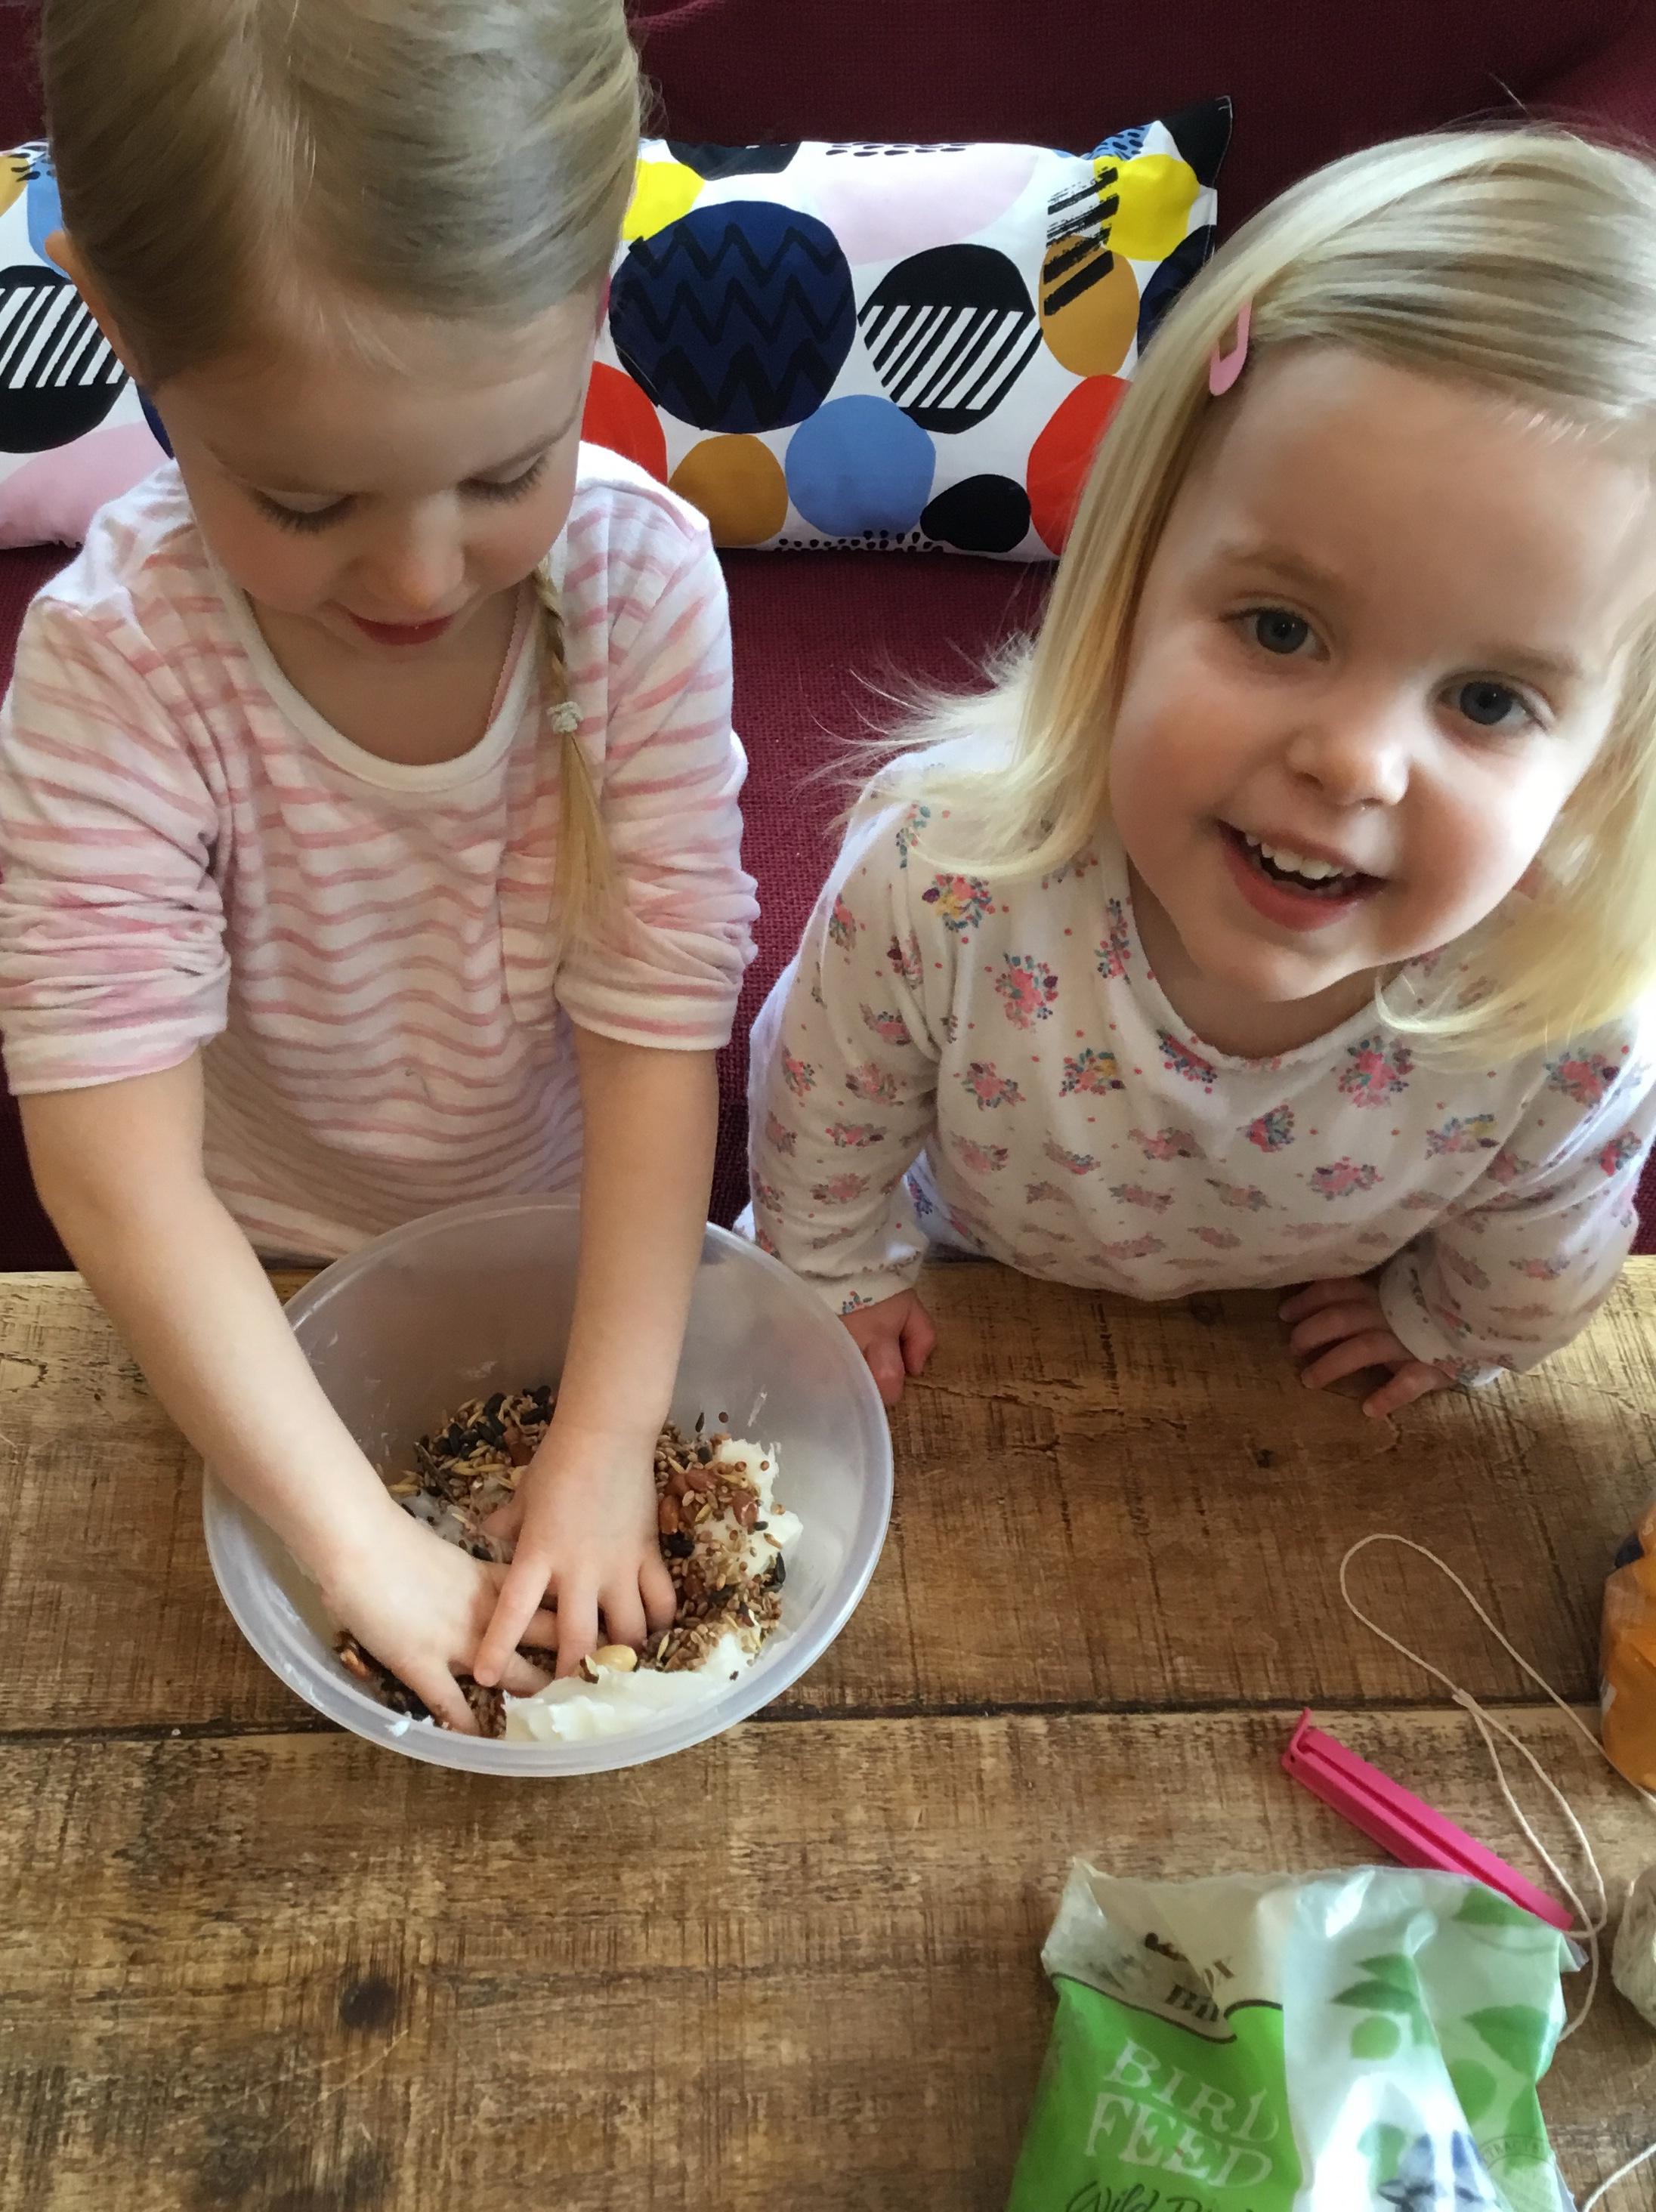 Feeding the Birds: Teaching Empathy